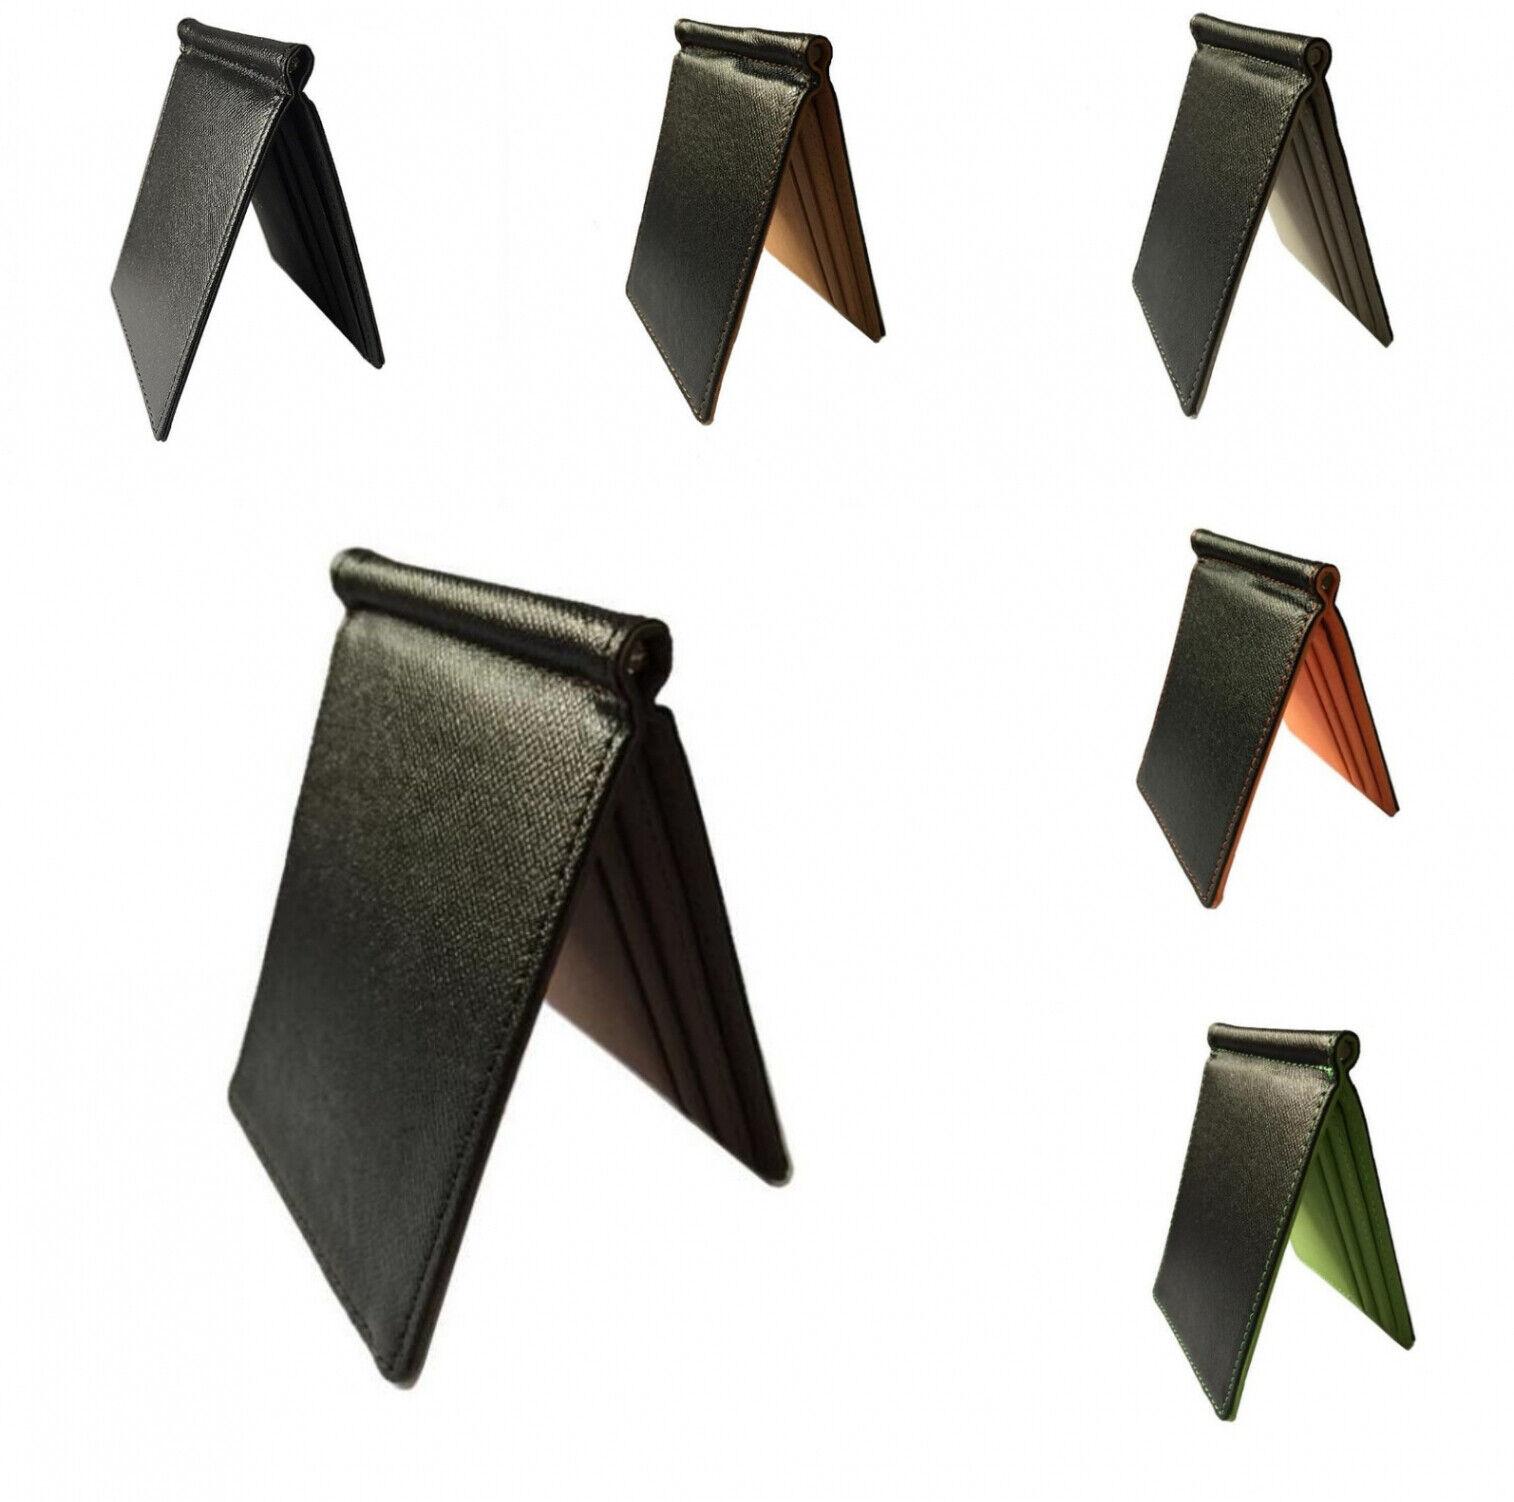 Minimalist Wallet Casual Super Ultra-thin Slim Faux Leather Money Clip Purse